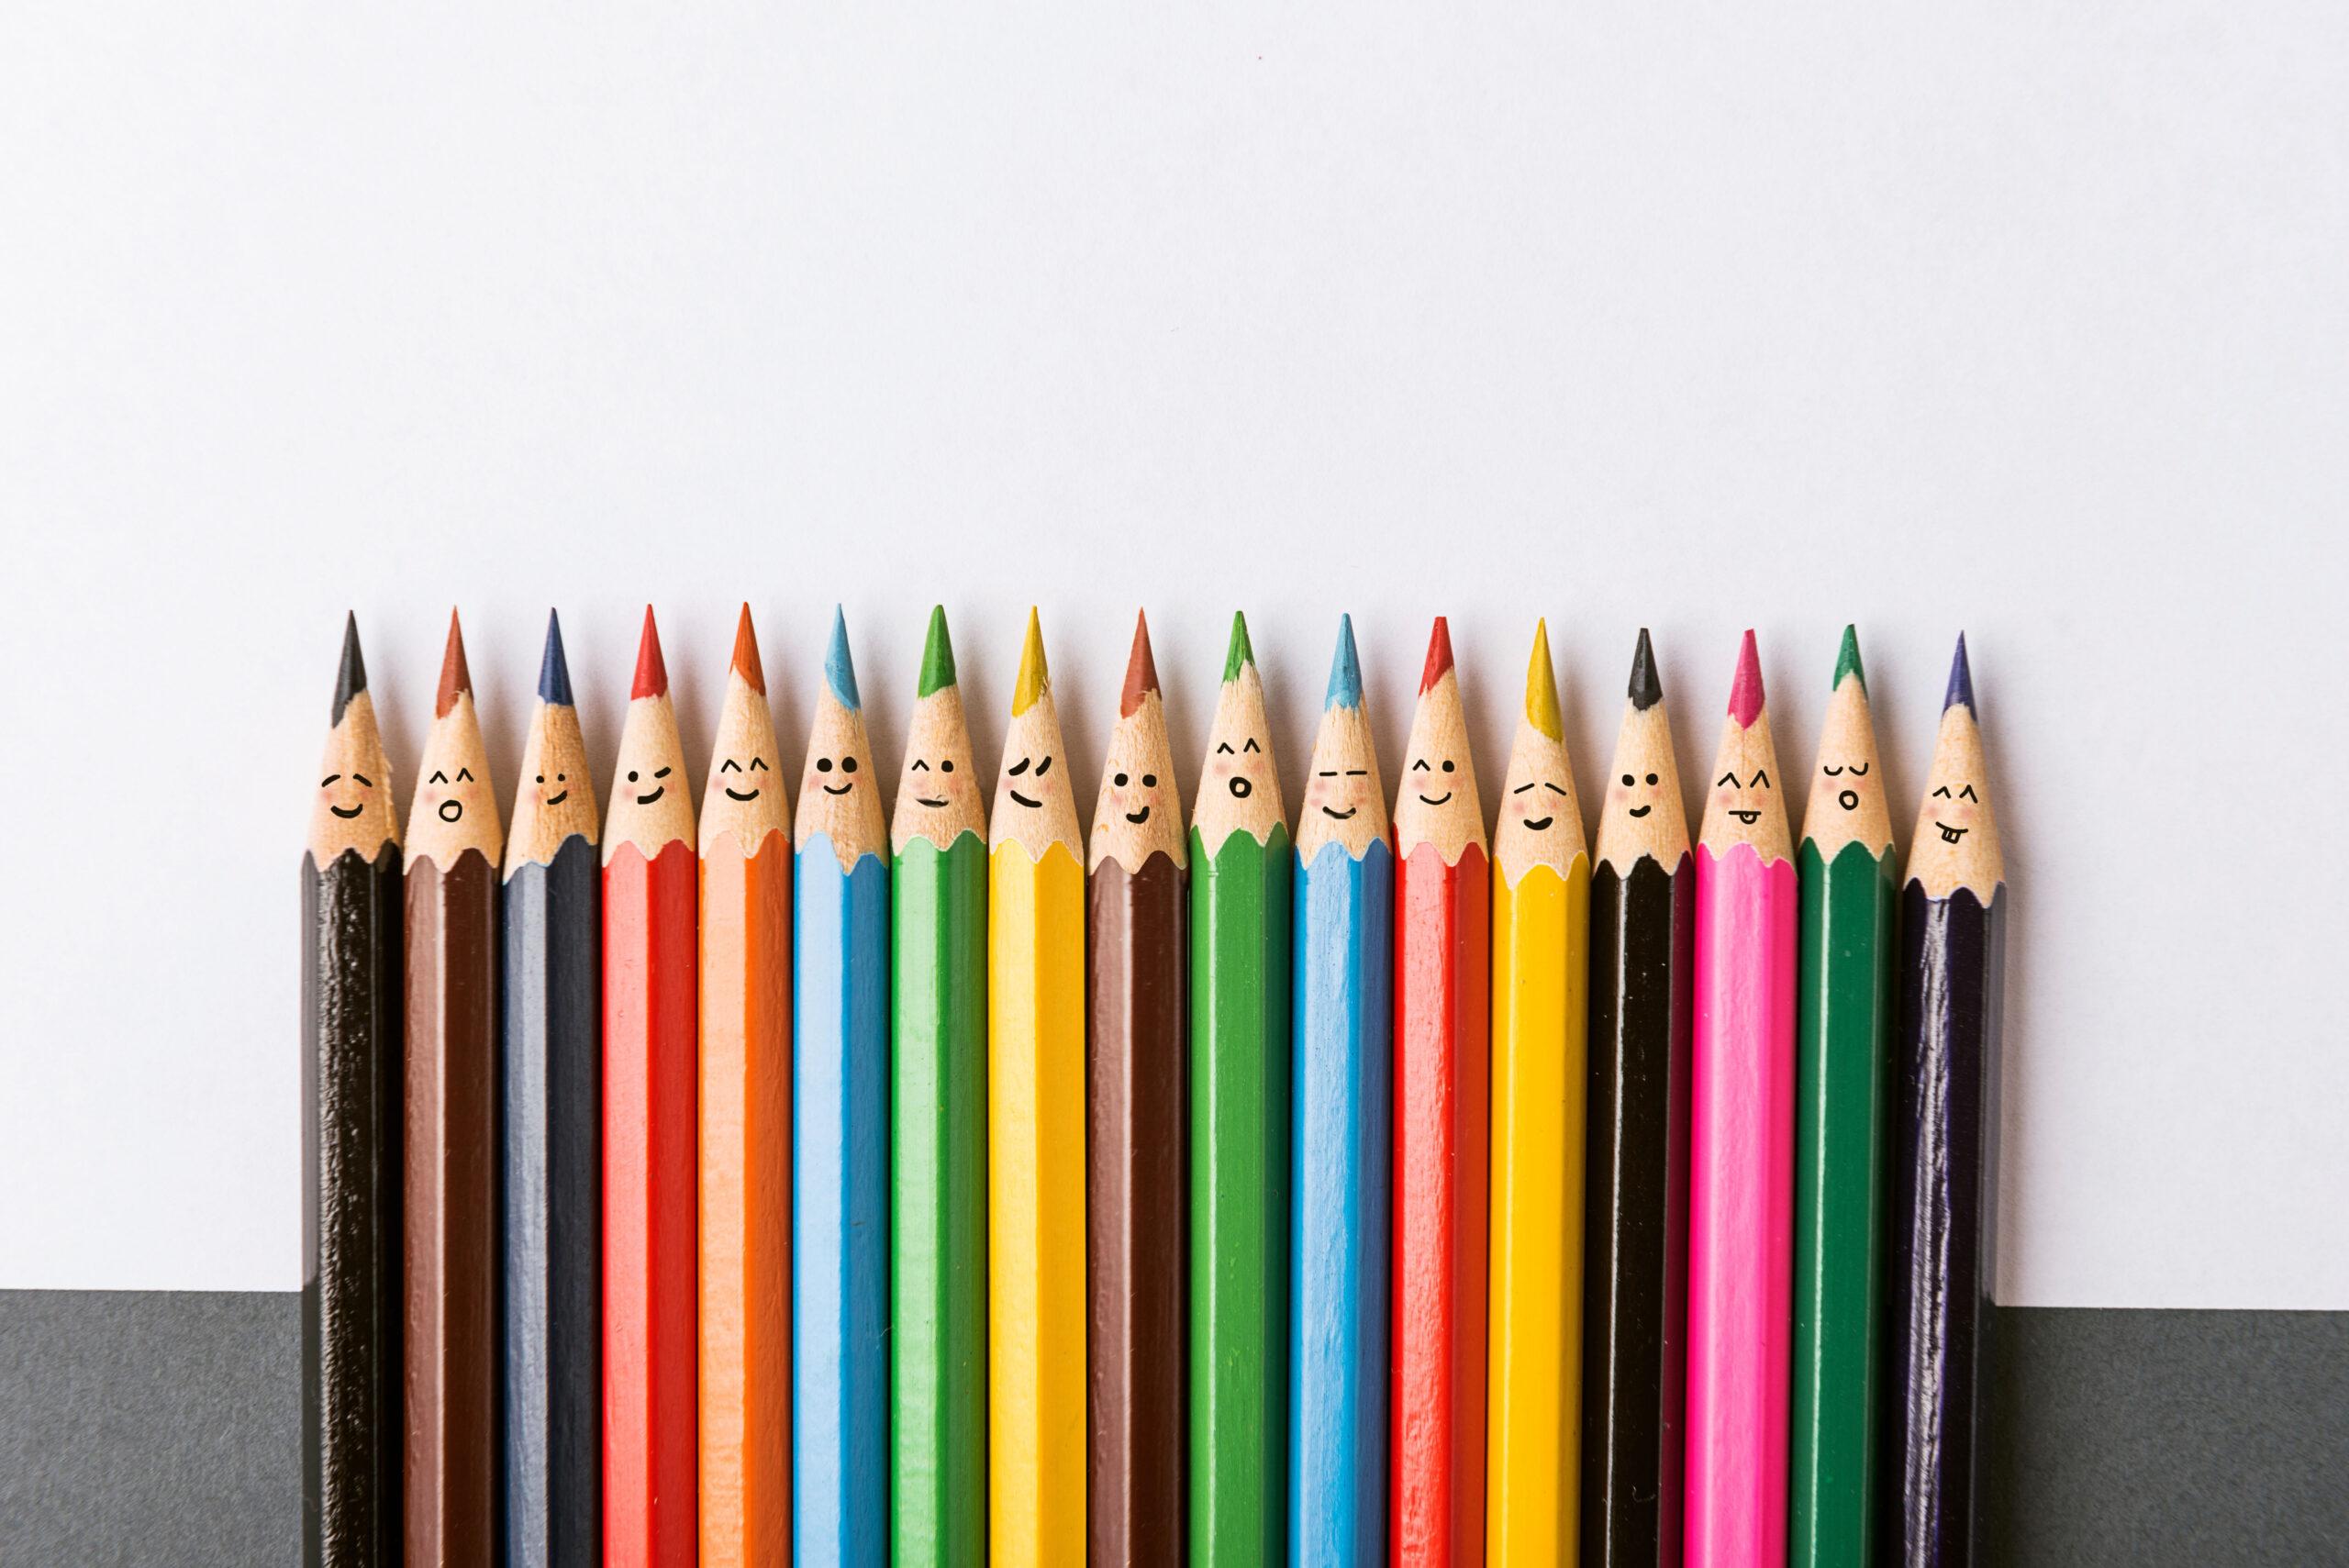 Smiling pencil crayons